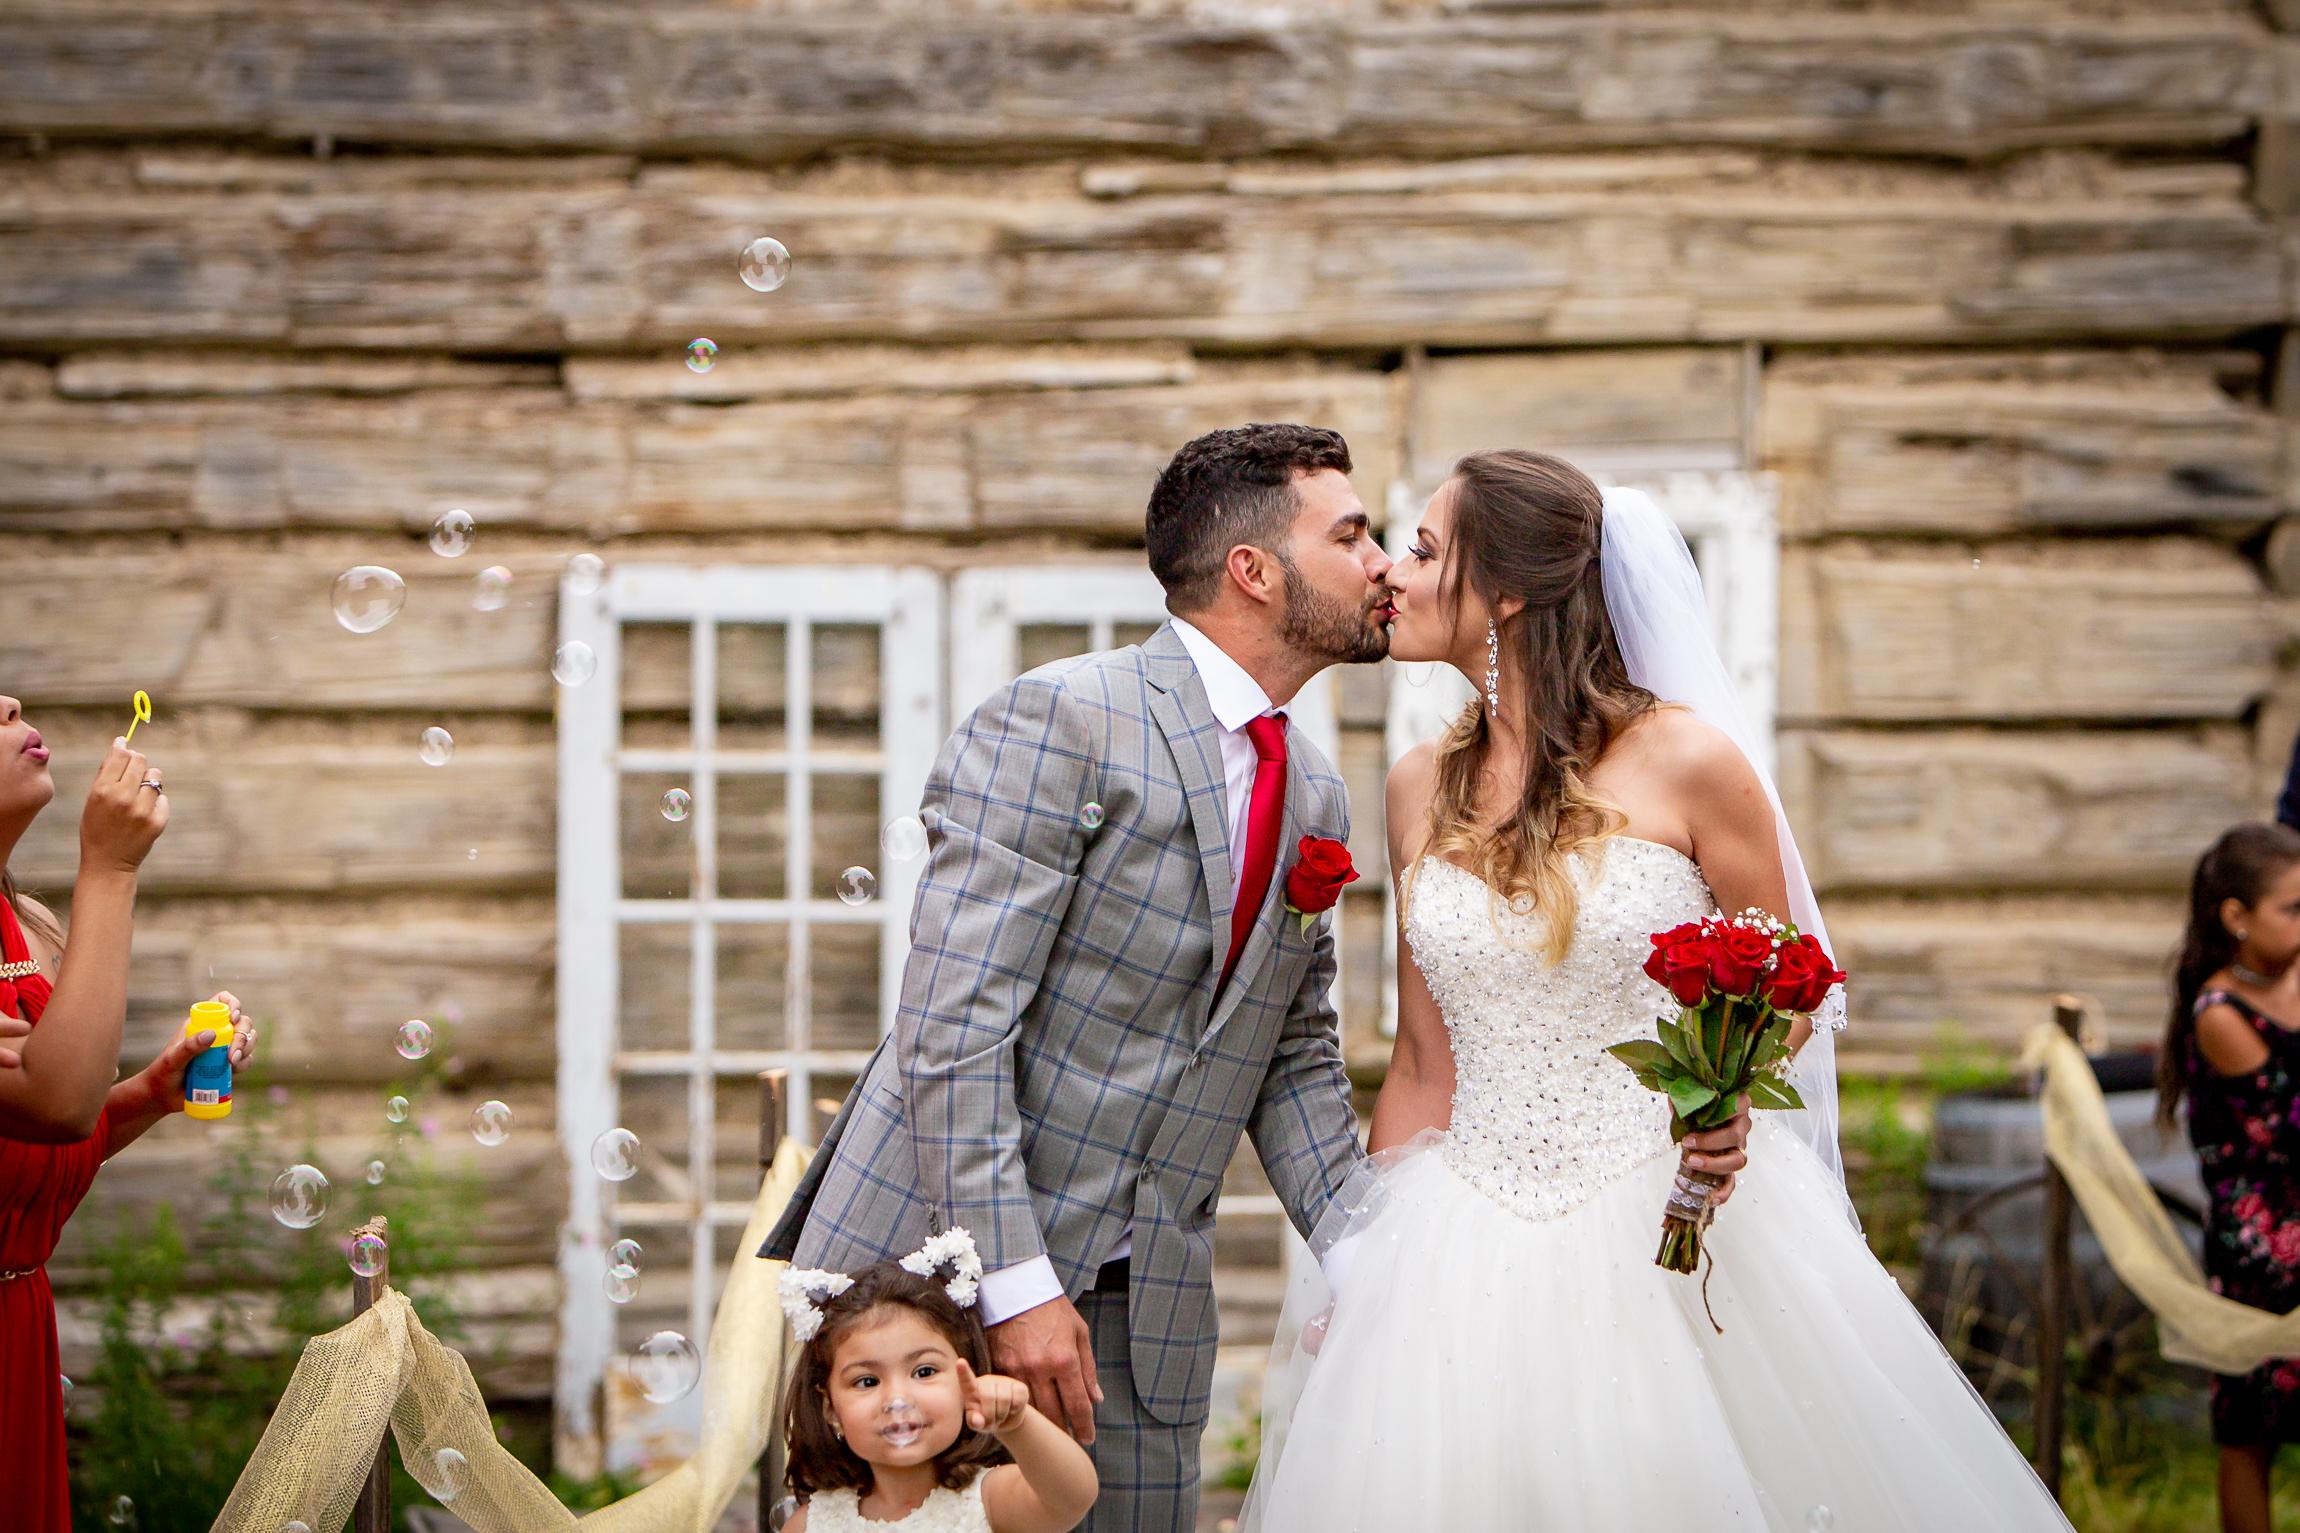 Toronto-wedding-Photograper-97.jpg